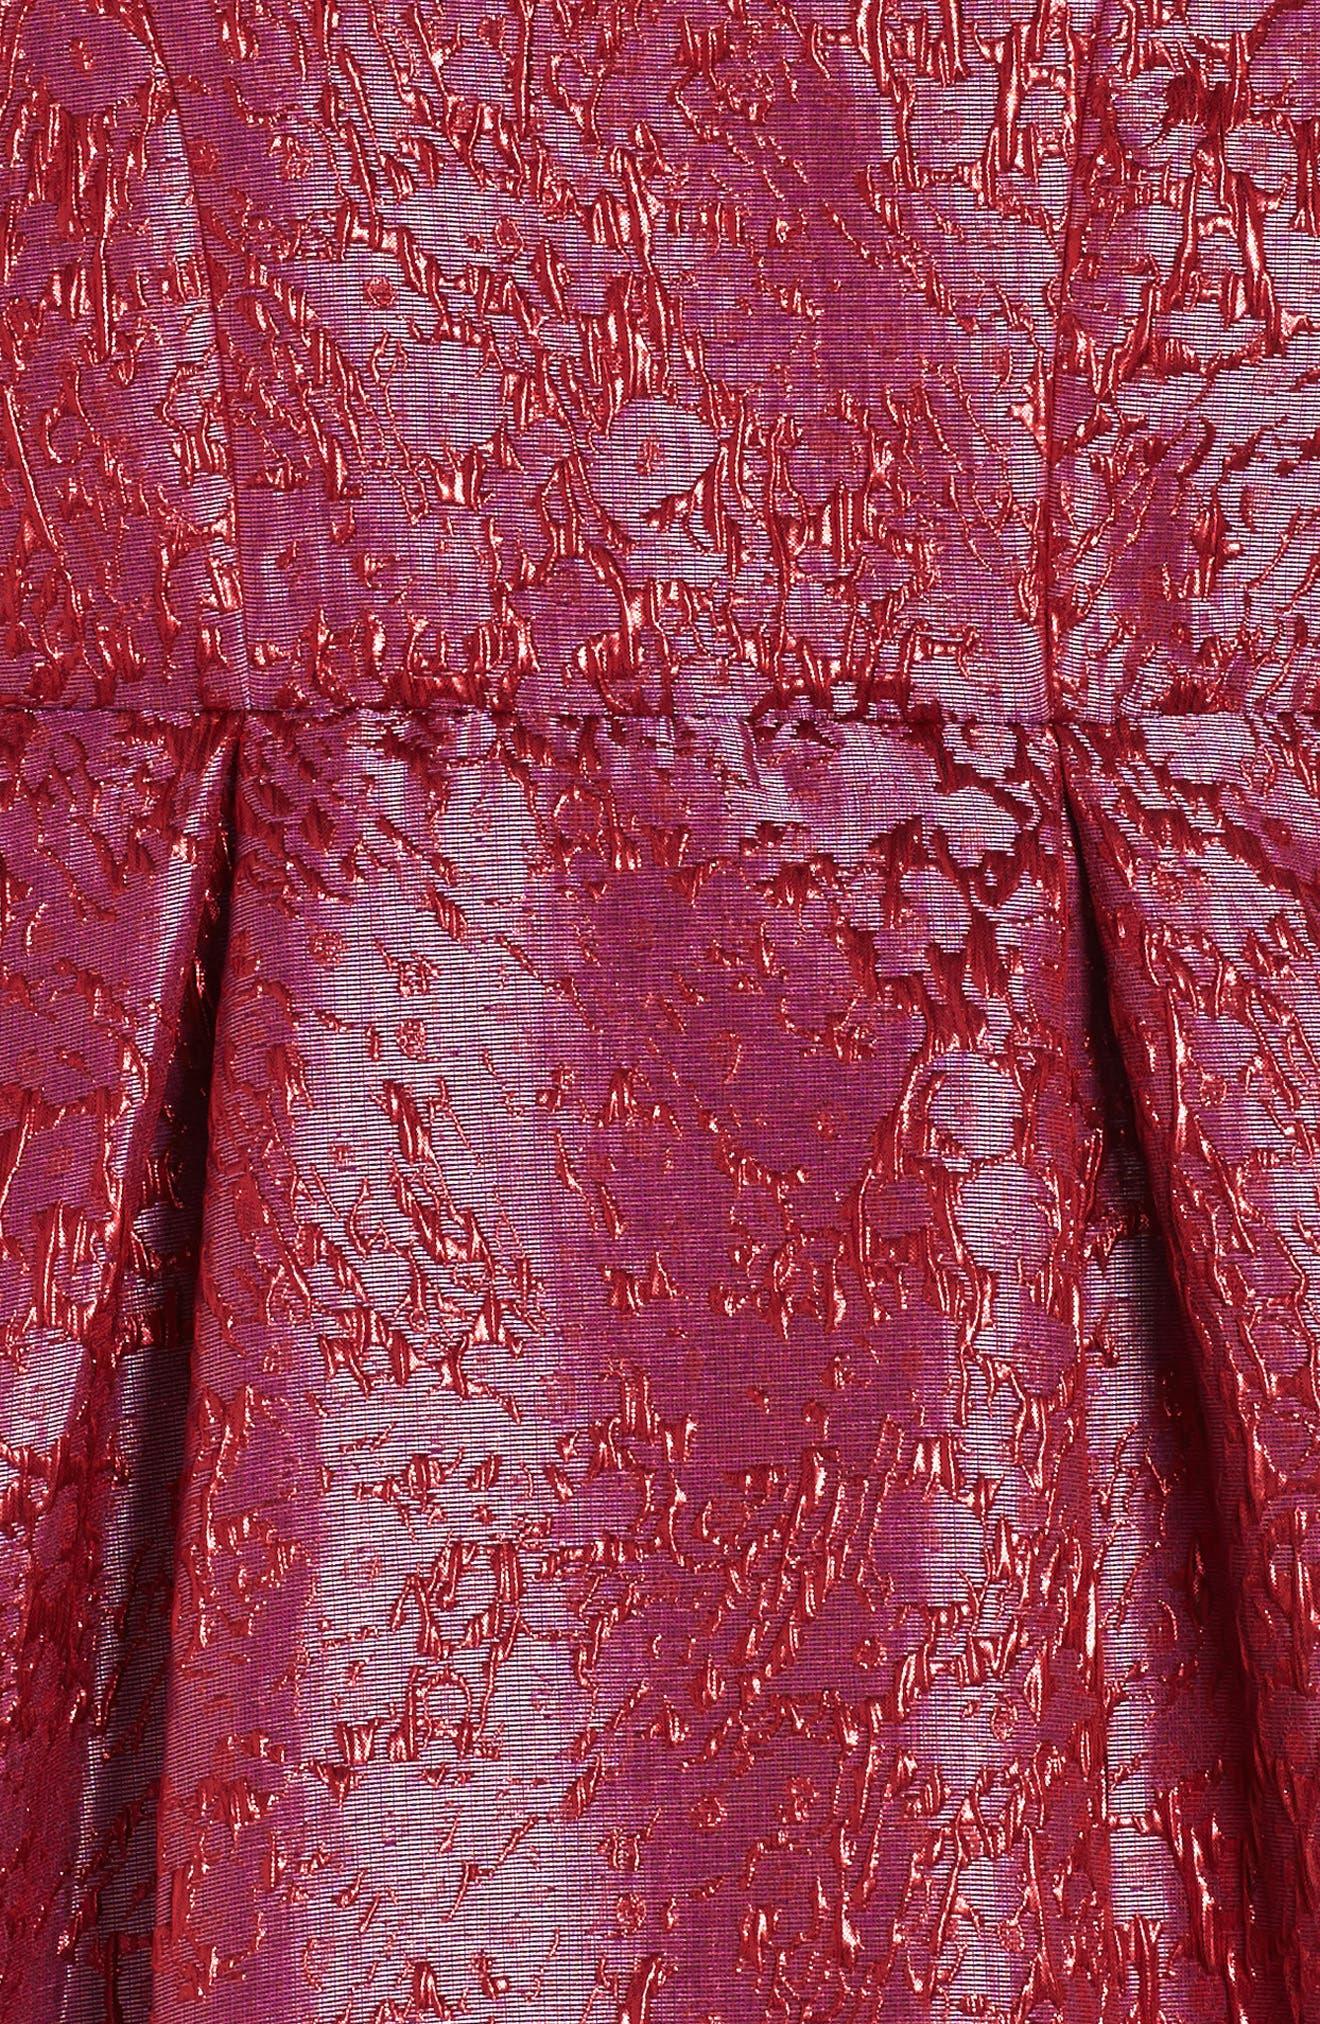 Textured Jacquard Dress,                             Alternate thumbnail 3, color,                             Pink Virtue Crackle